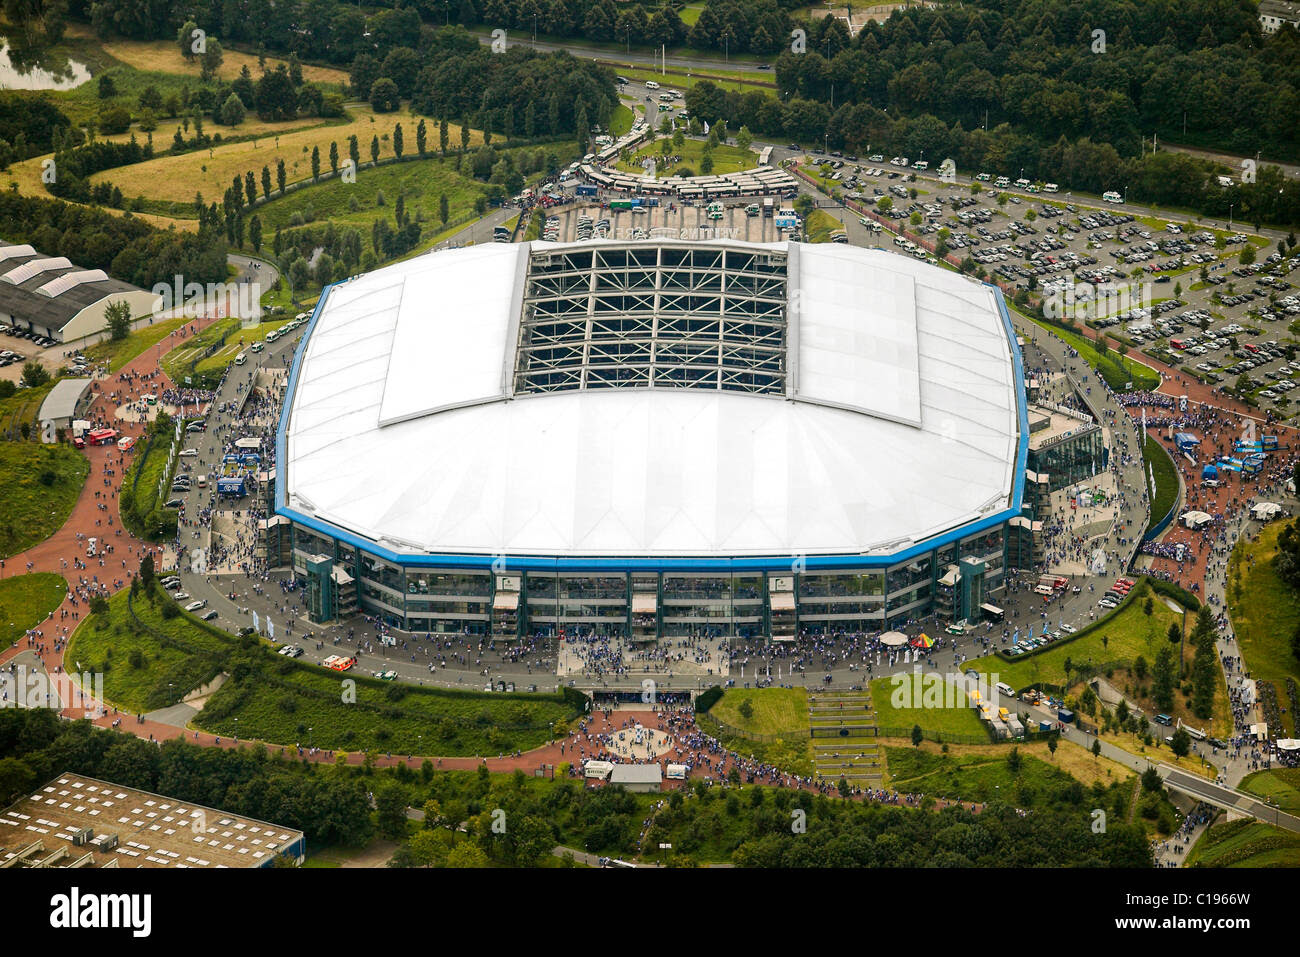 Aerial photo, Arena Auf Schalke, Schalke arena, Veltins Arena Stock Photo, Royalty Free Image ...